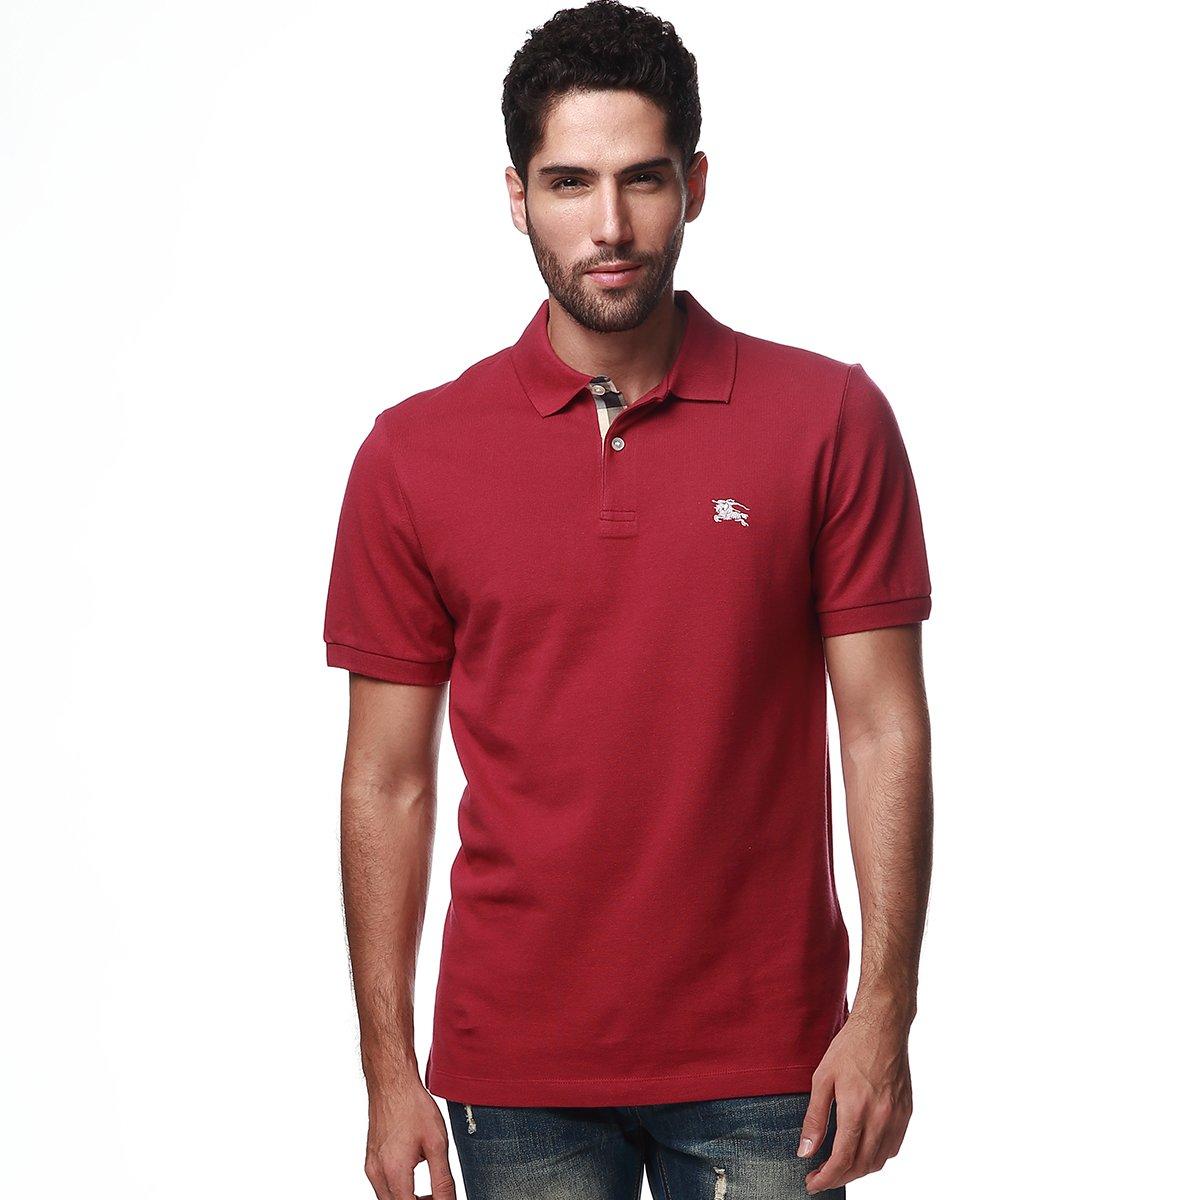 4e7fdb32b836 Burberry Brit Men s Berry Pink Check Cotton Pique Logo Slim Fit Polo  T-shirt L at Amazon Men s Clothing store